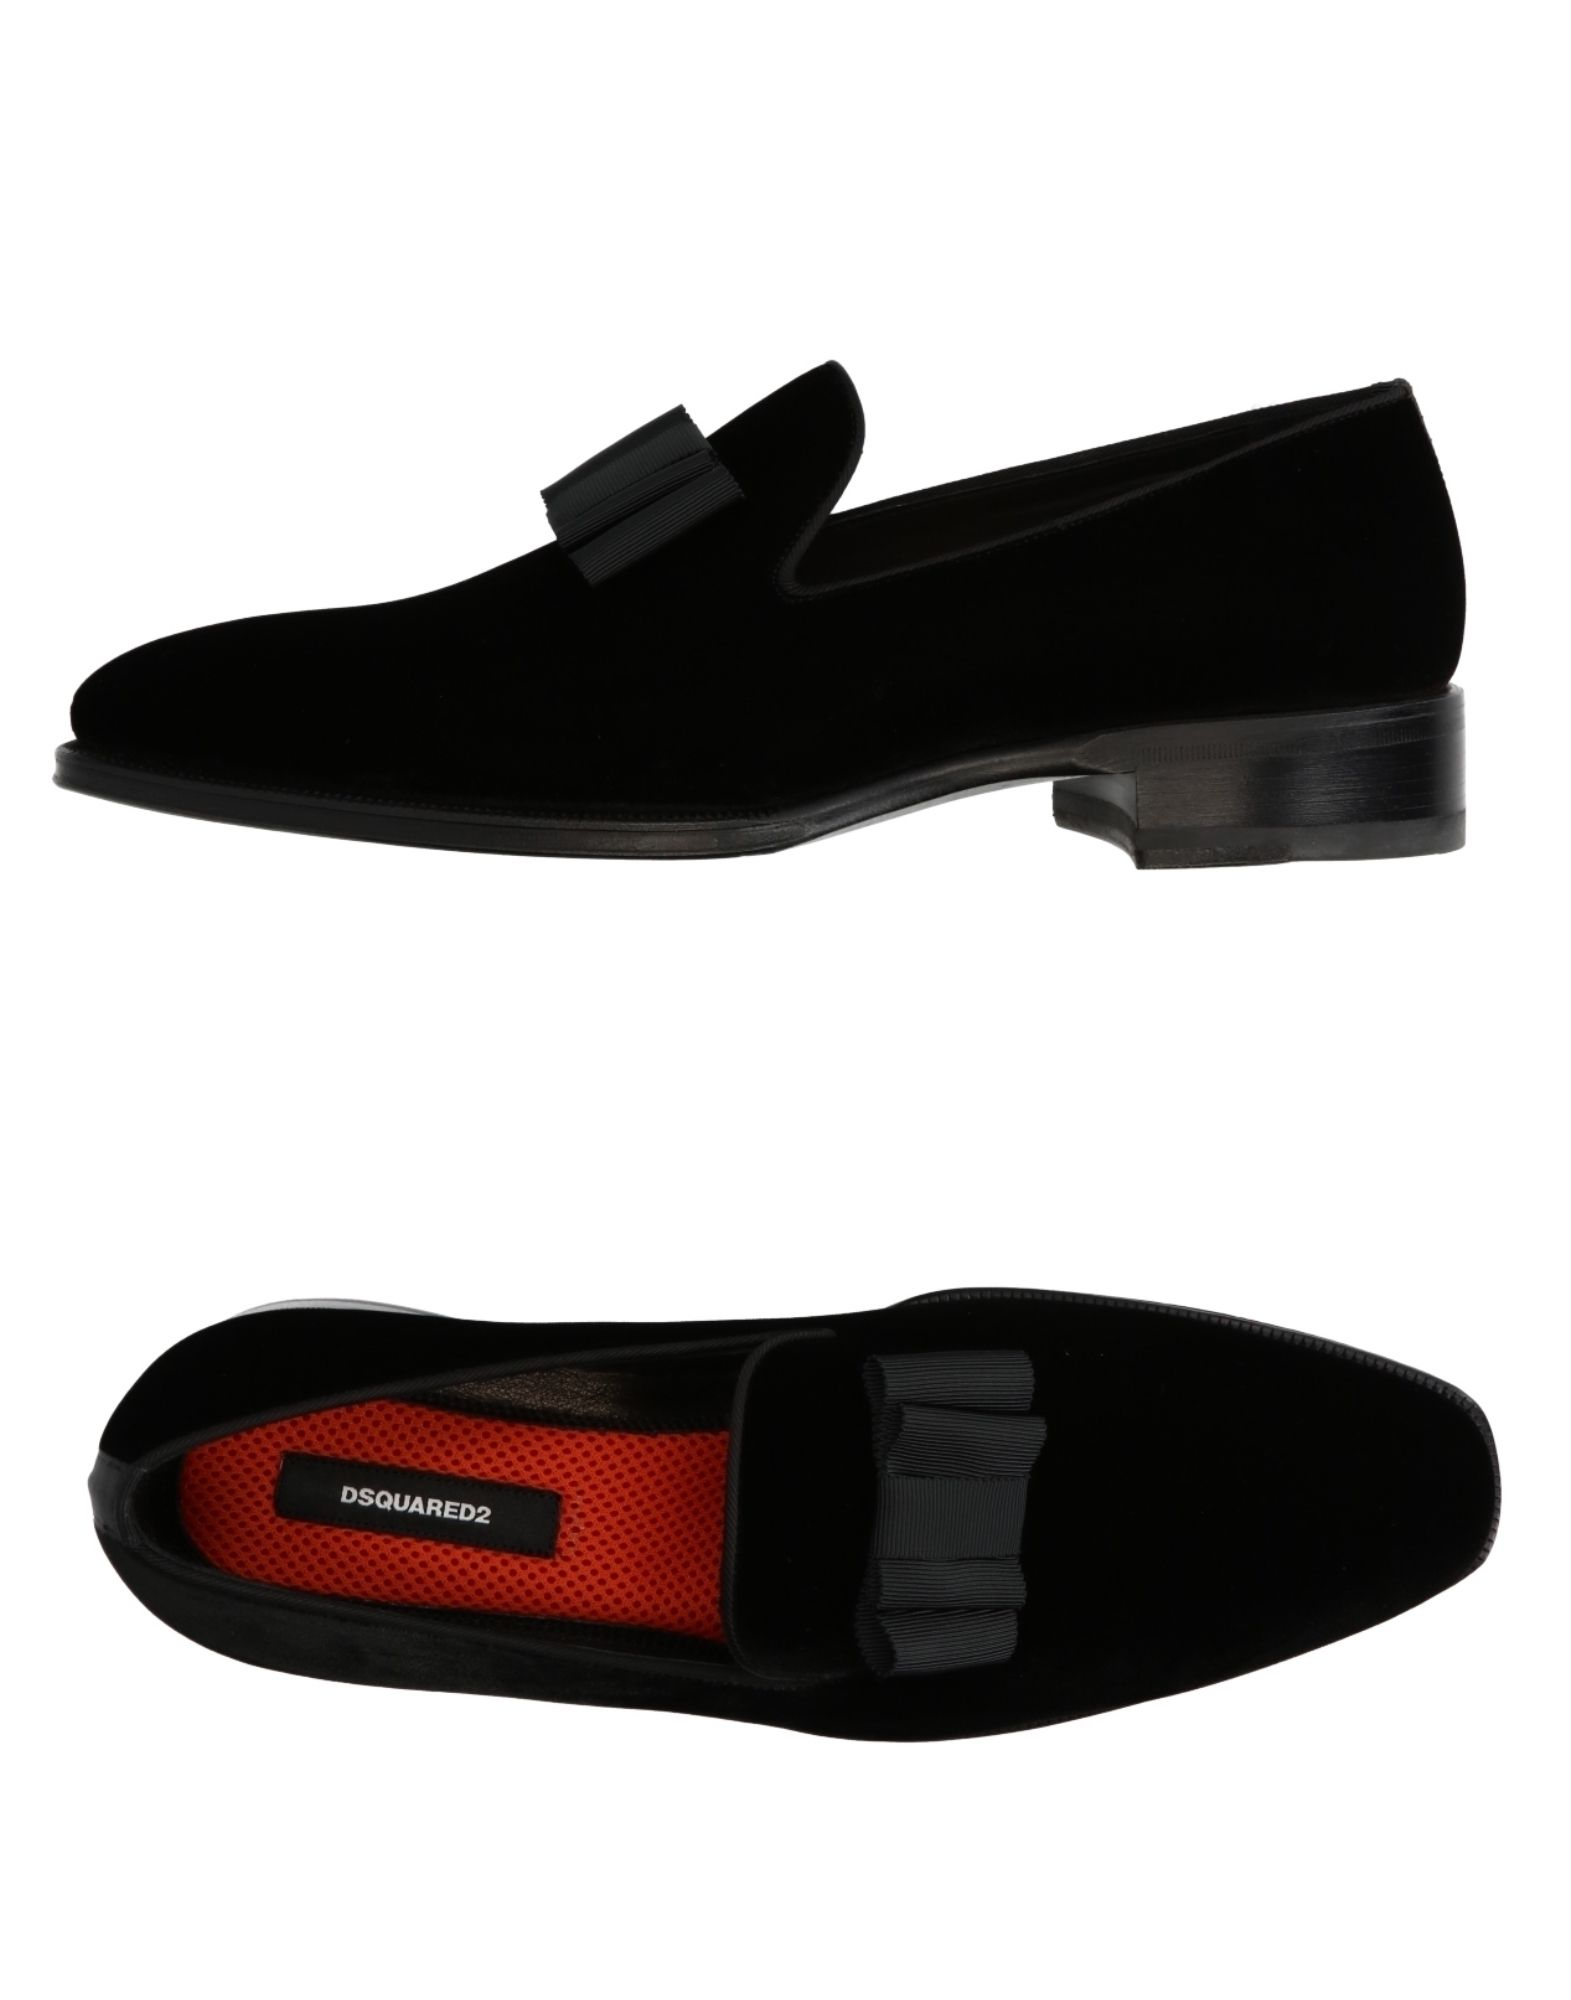 Dsquared2 Mokassins Herren  11298709CG Gute Qualität beliebte Schuhe